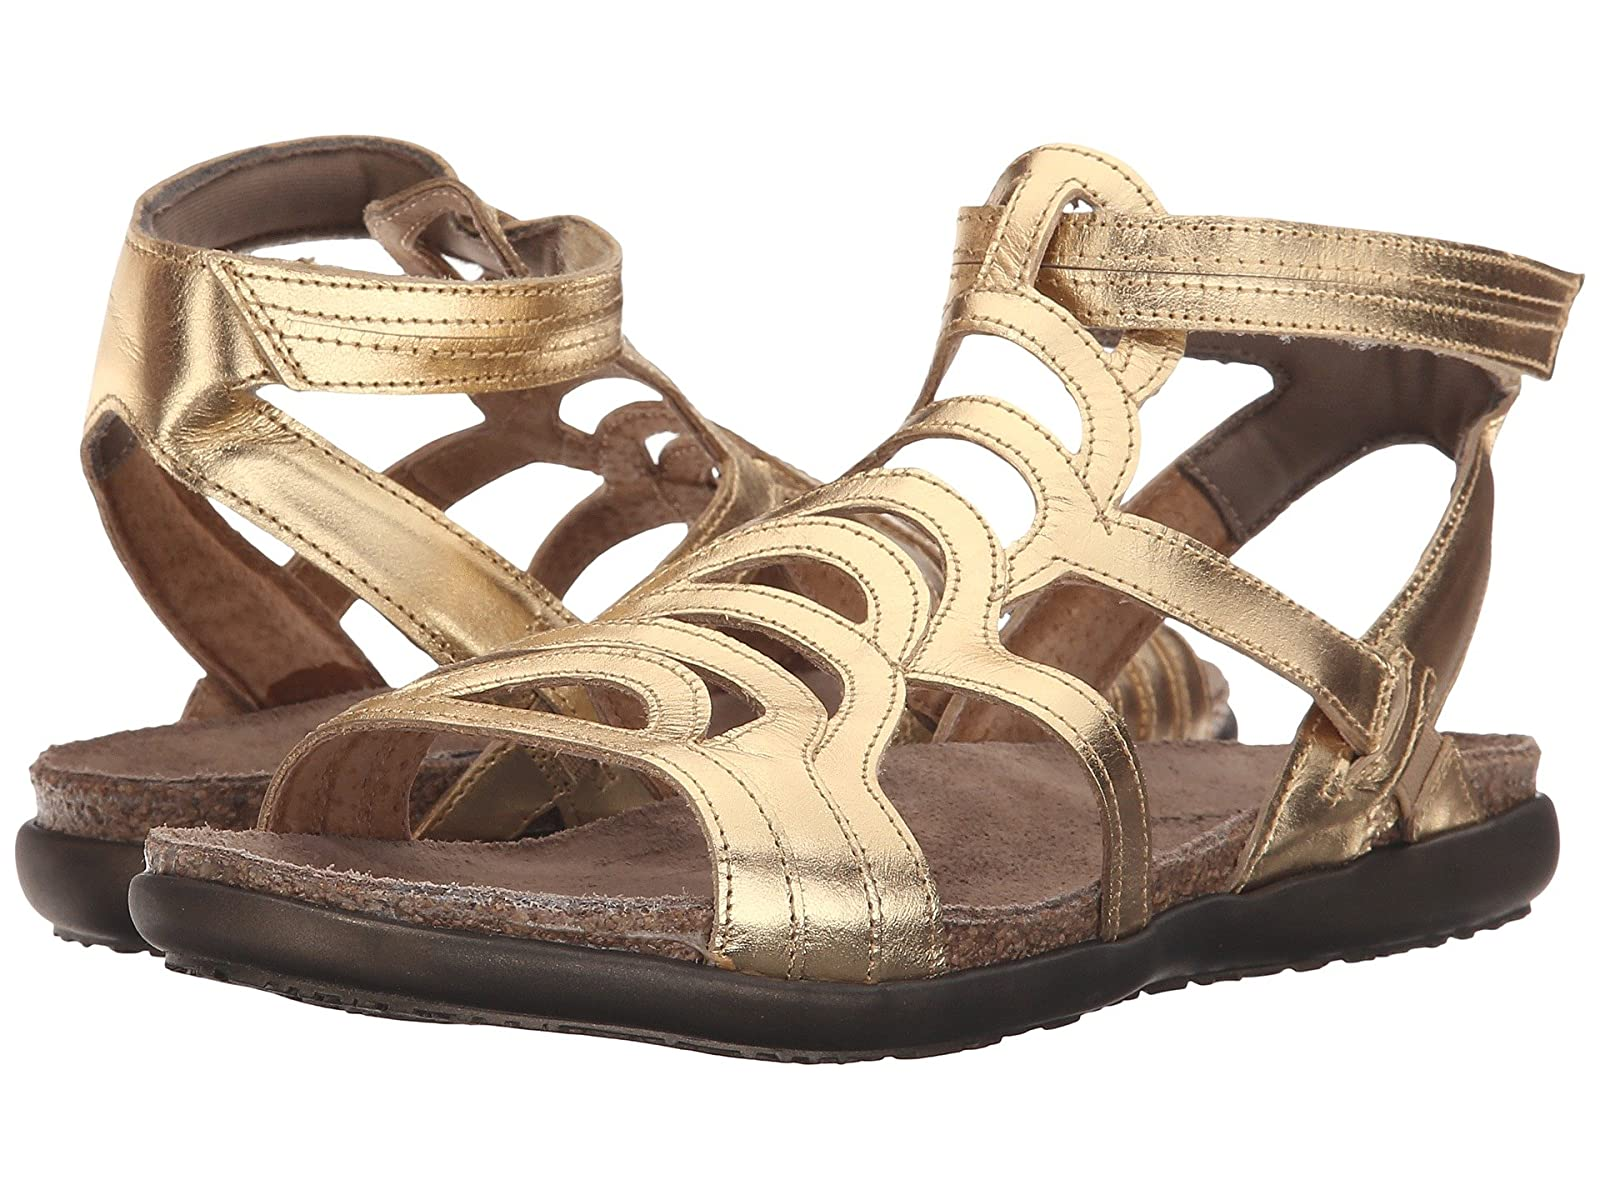 Naot SaraCheap and distinctive eye-catching shoes